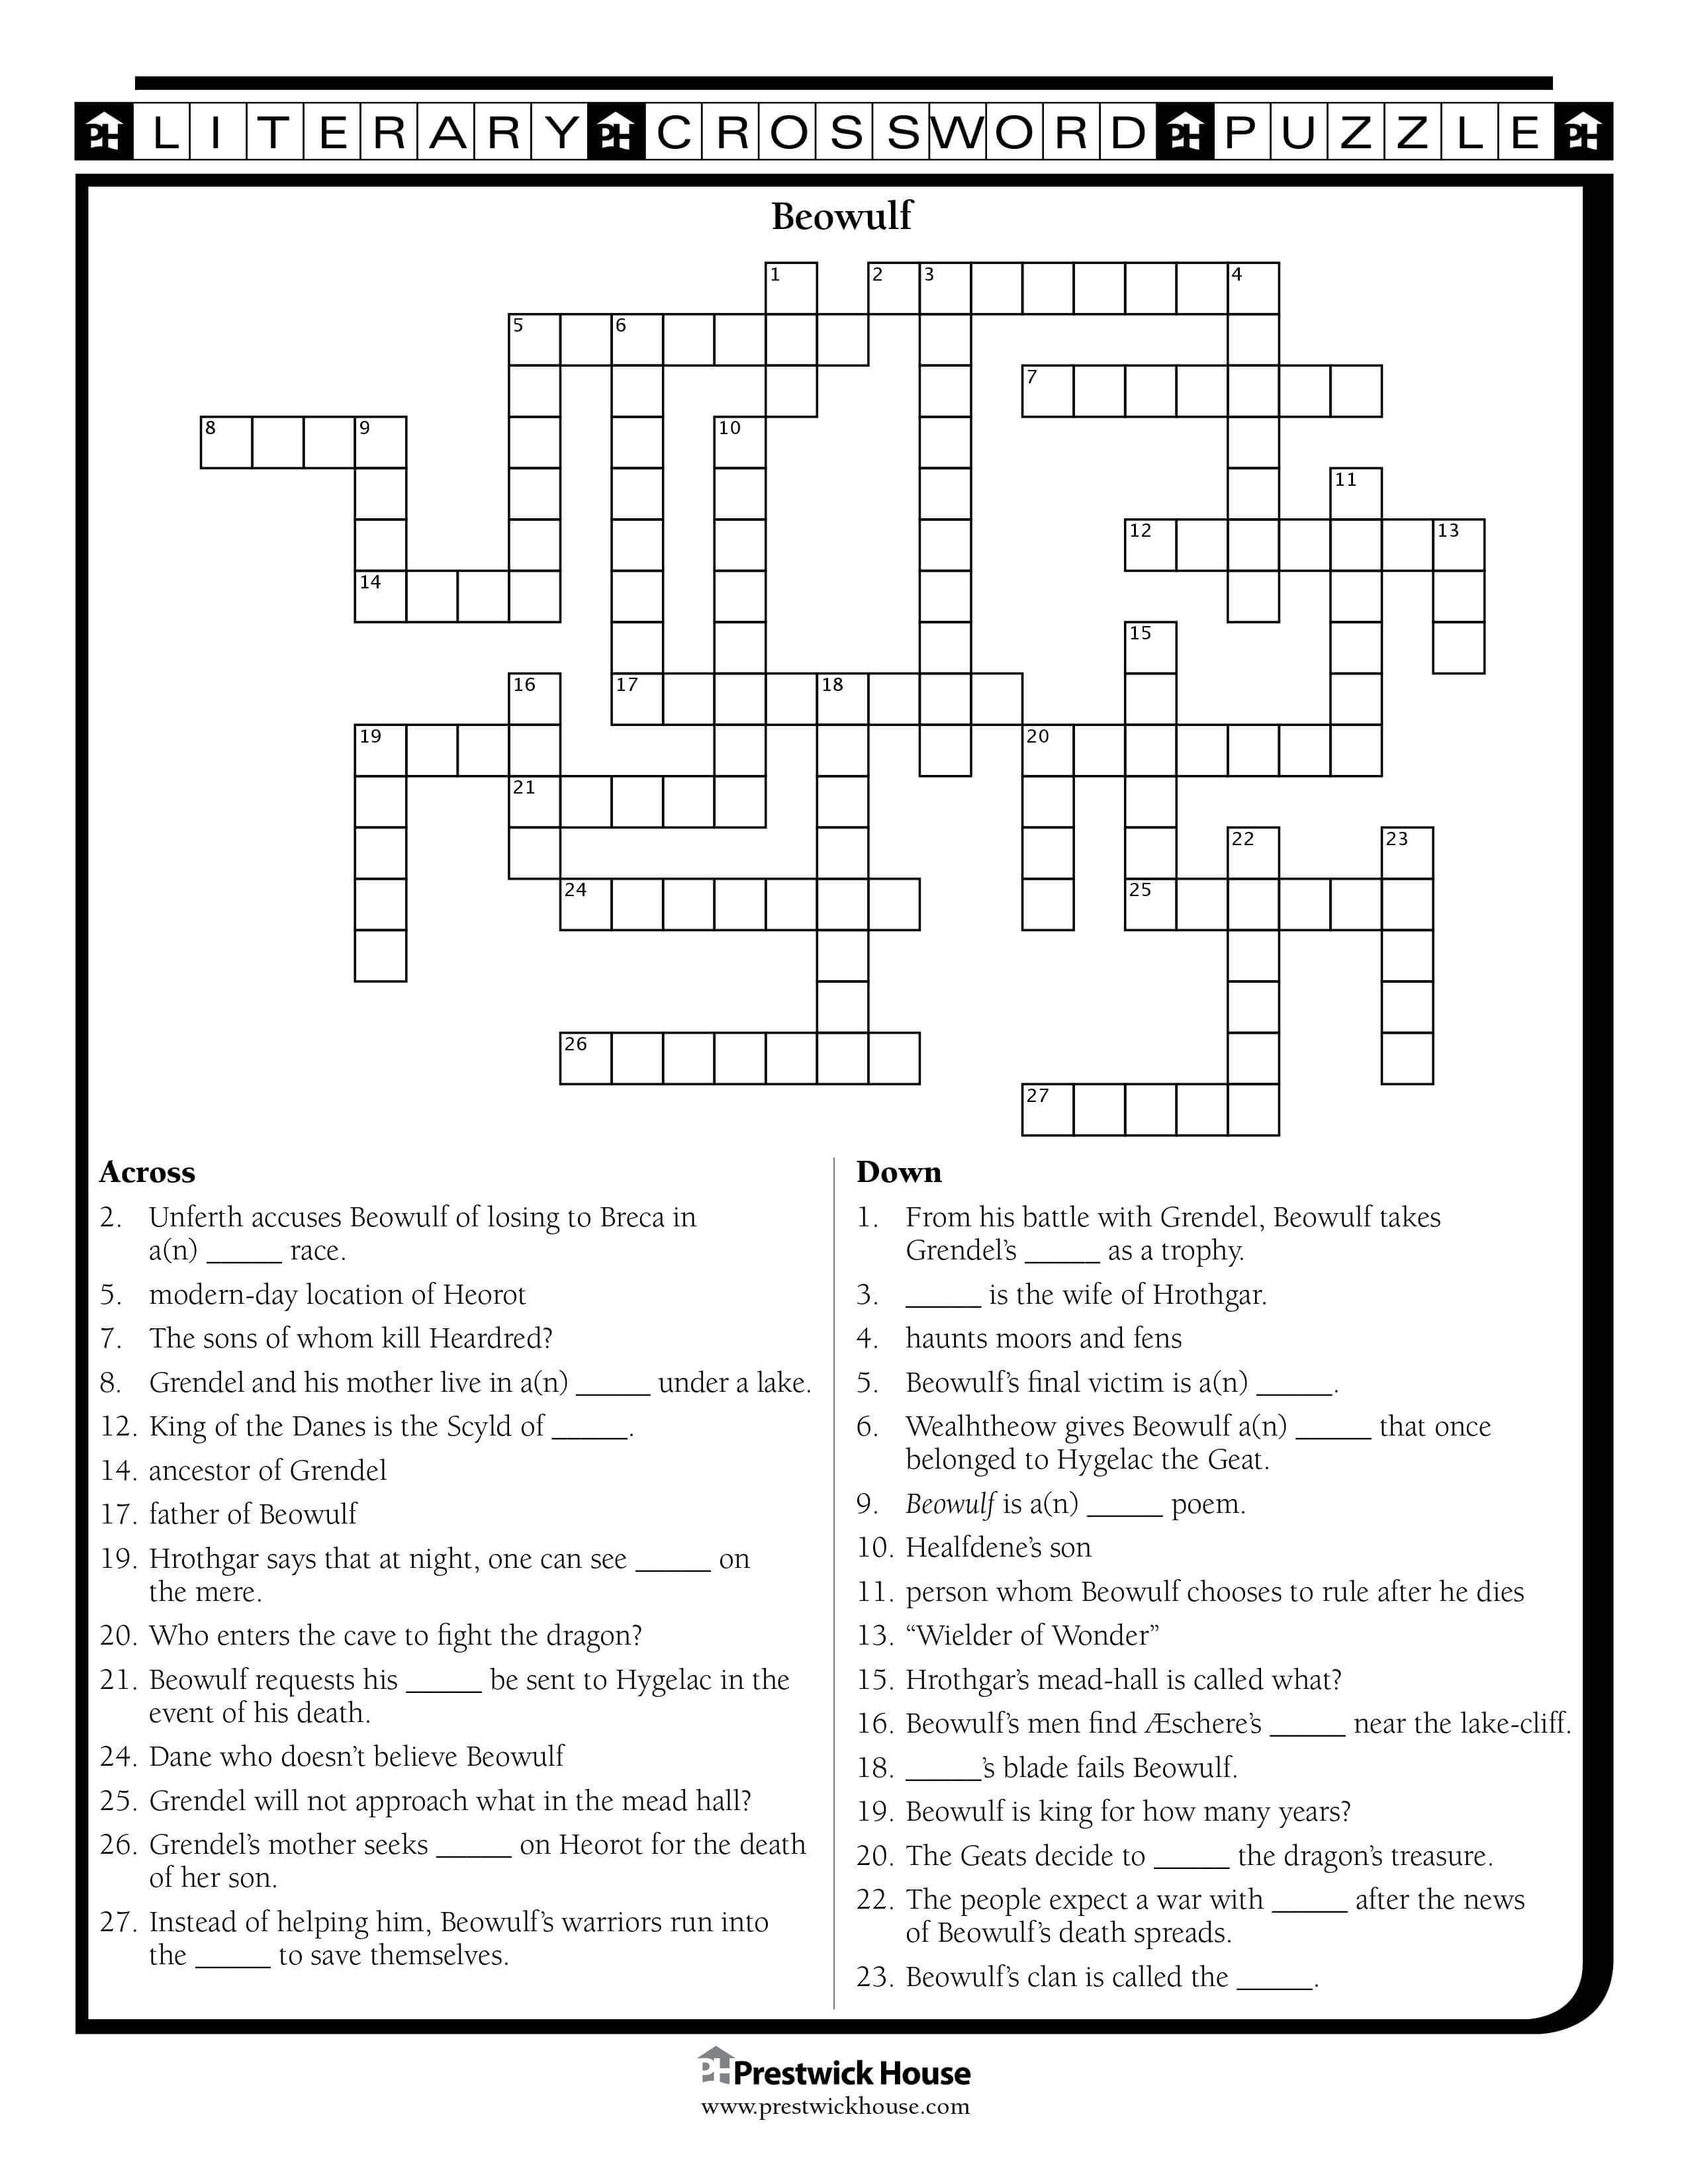 History Make Up Crossword Clue | Saubhaya Makeup - Printable Crossword Puzzles Boston Herald